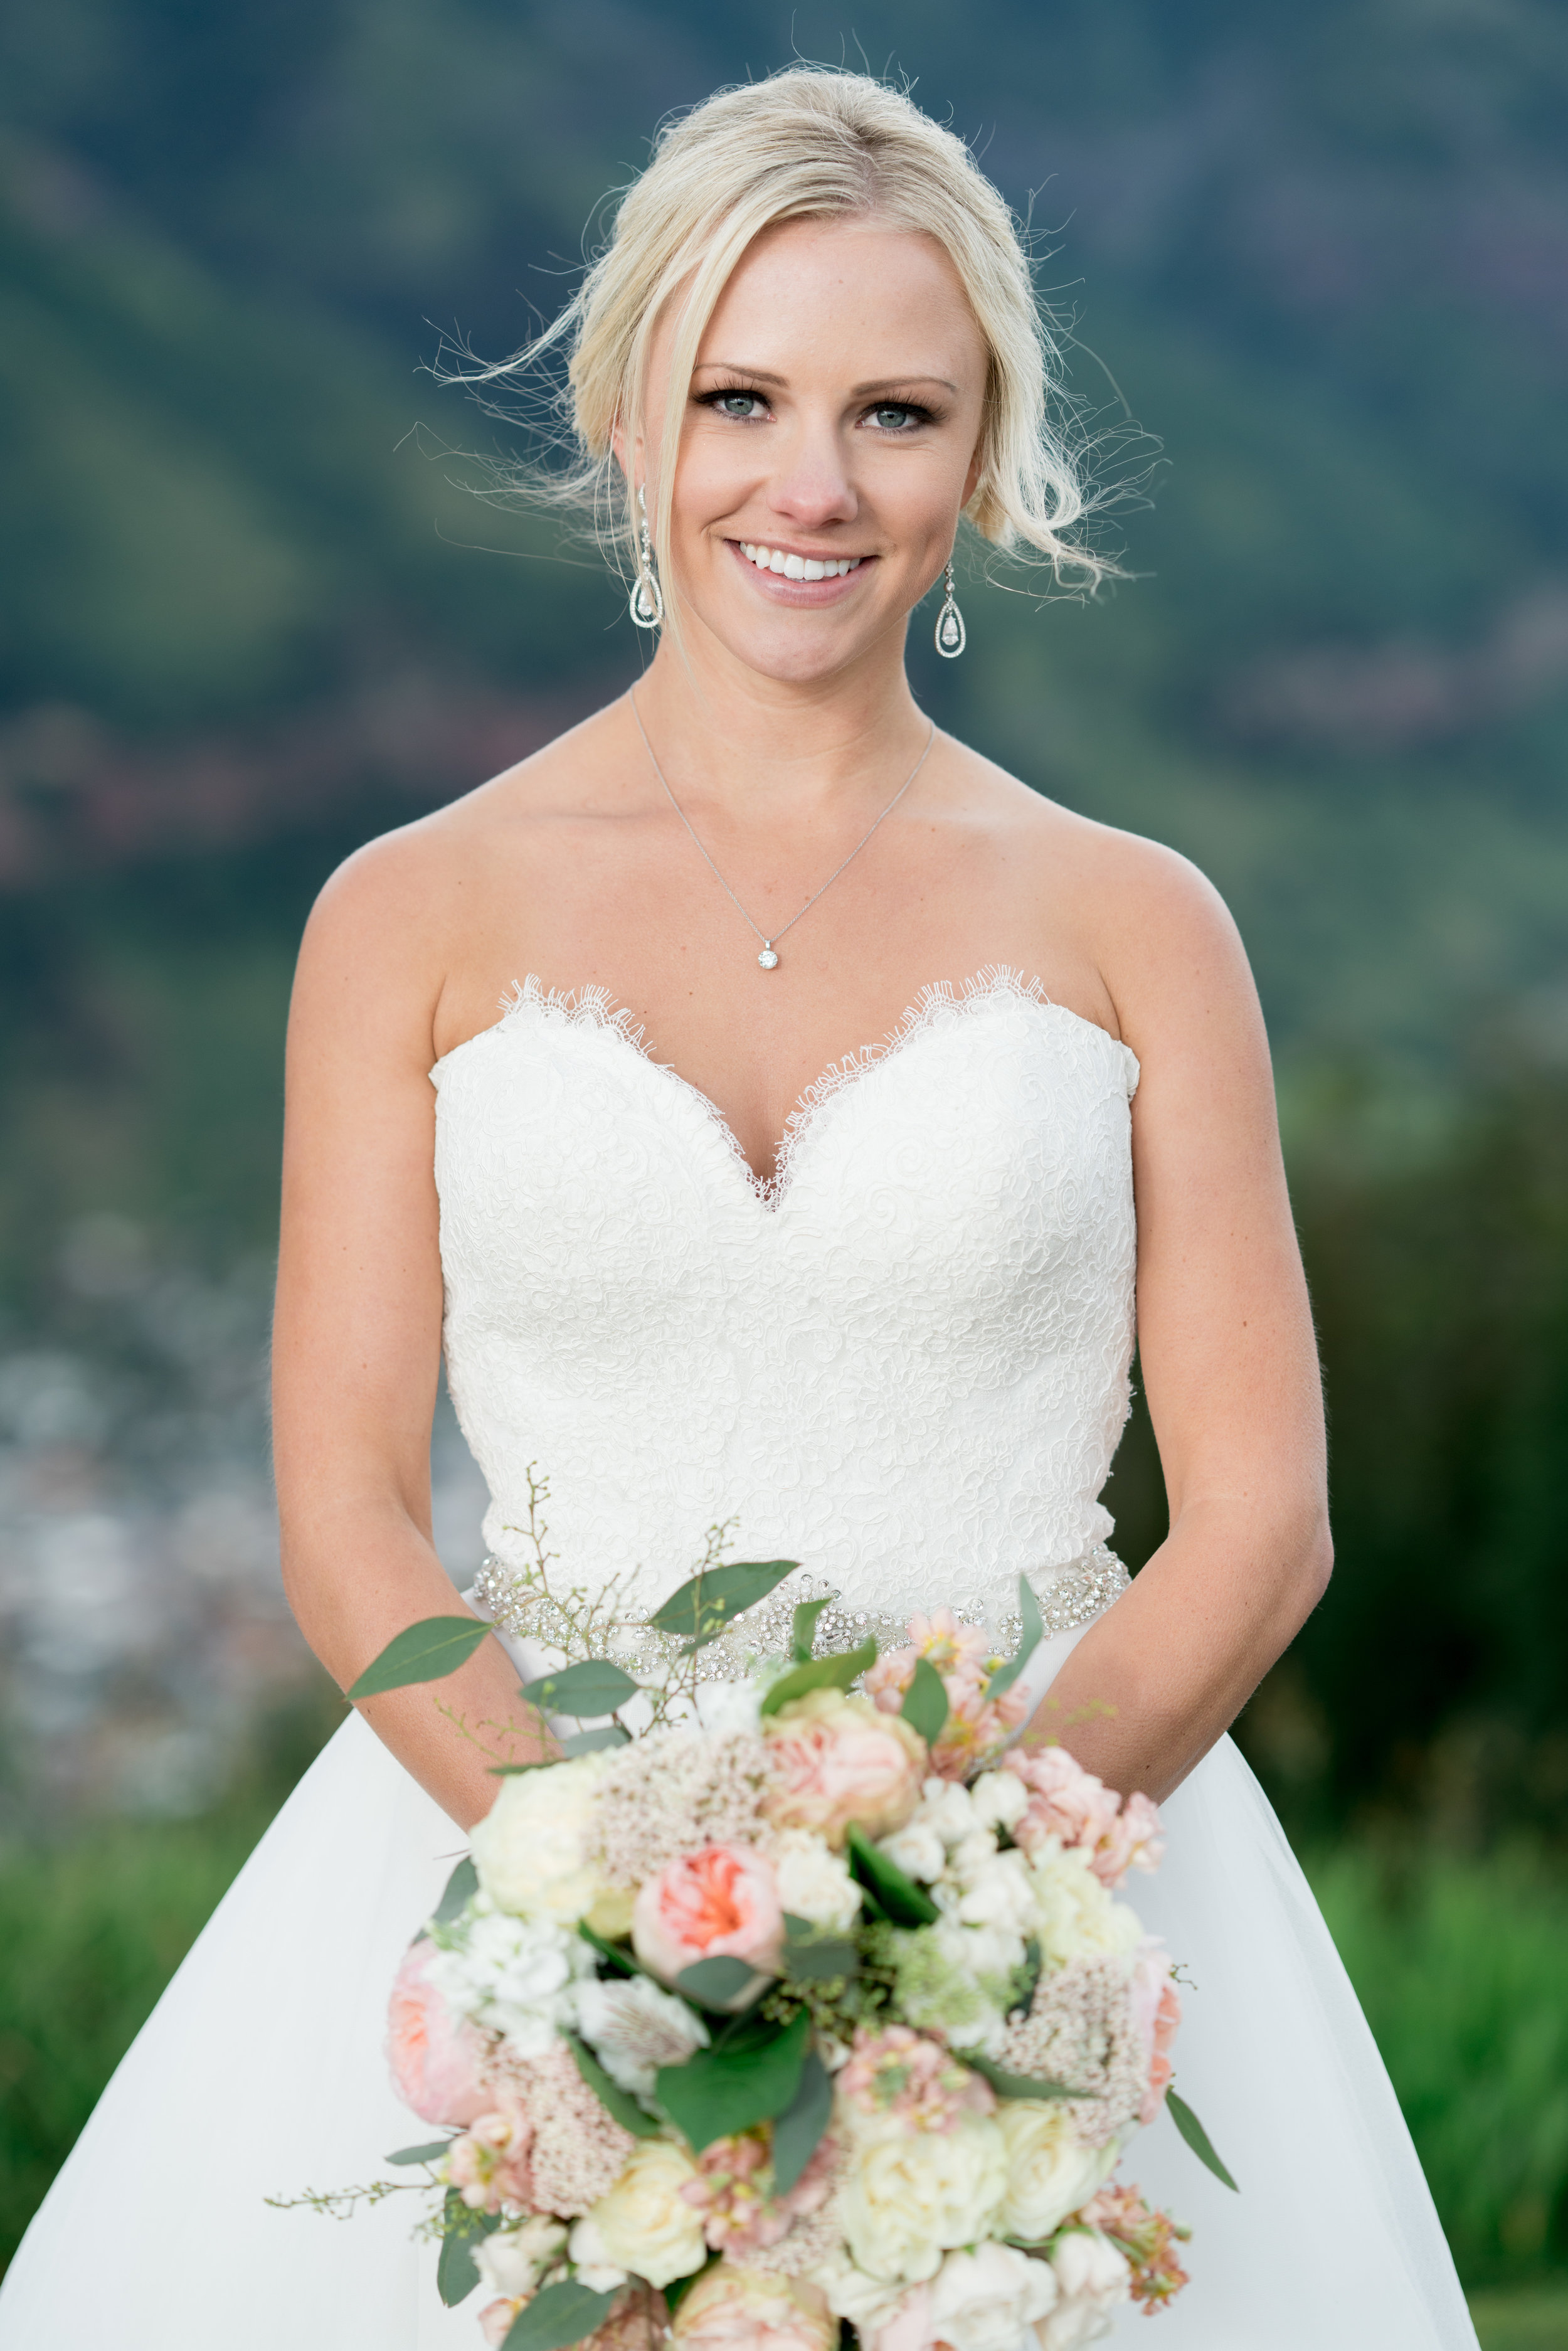 David Manning Photographer Bridal portrait